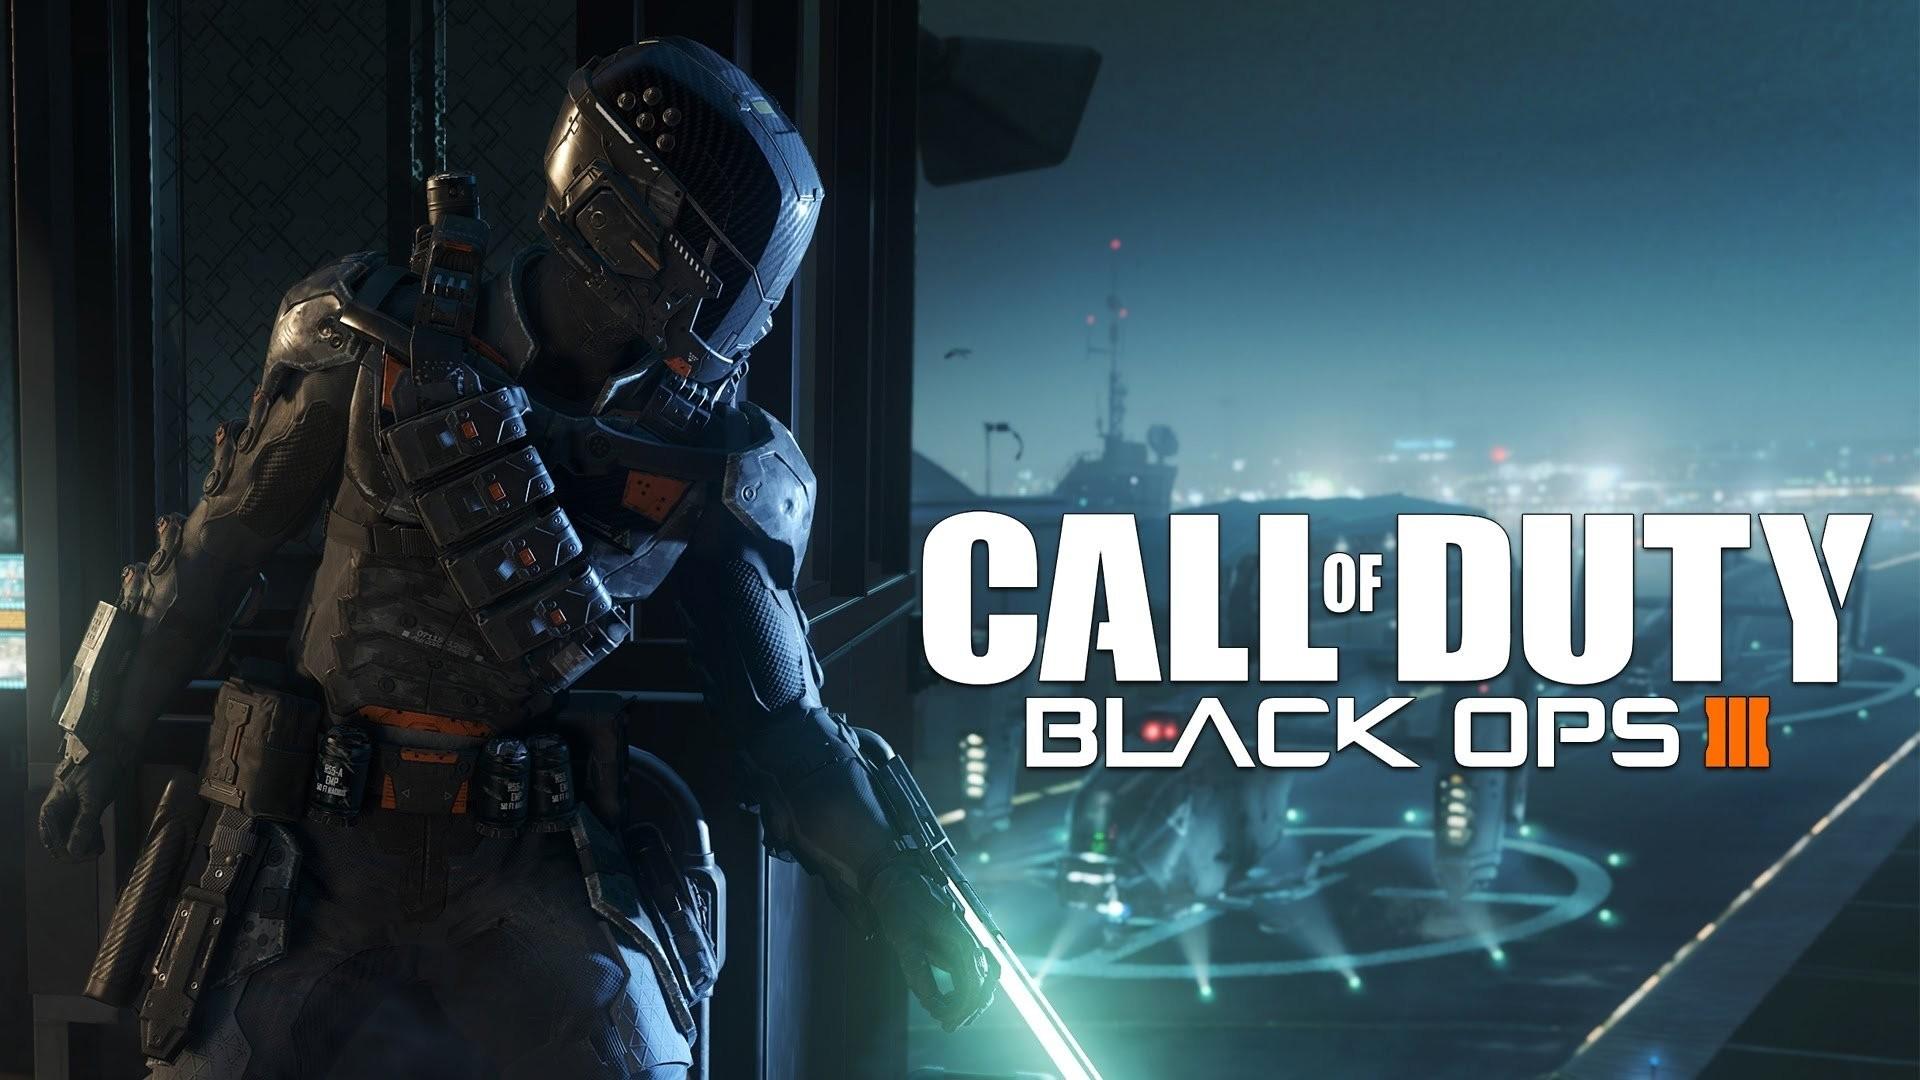 Res: 1920x1080, Call Of Duty: Black Ops 3 Wallpapers Desktop Background ~ Desktop Wallpaper  Box